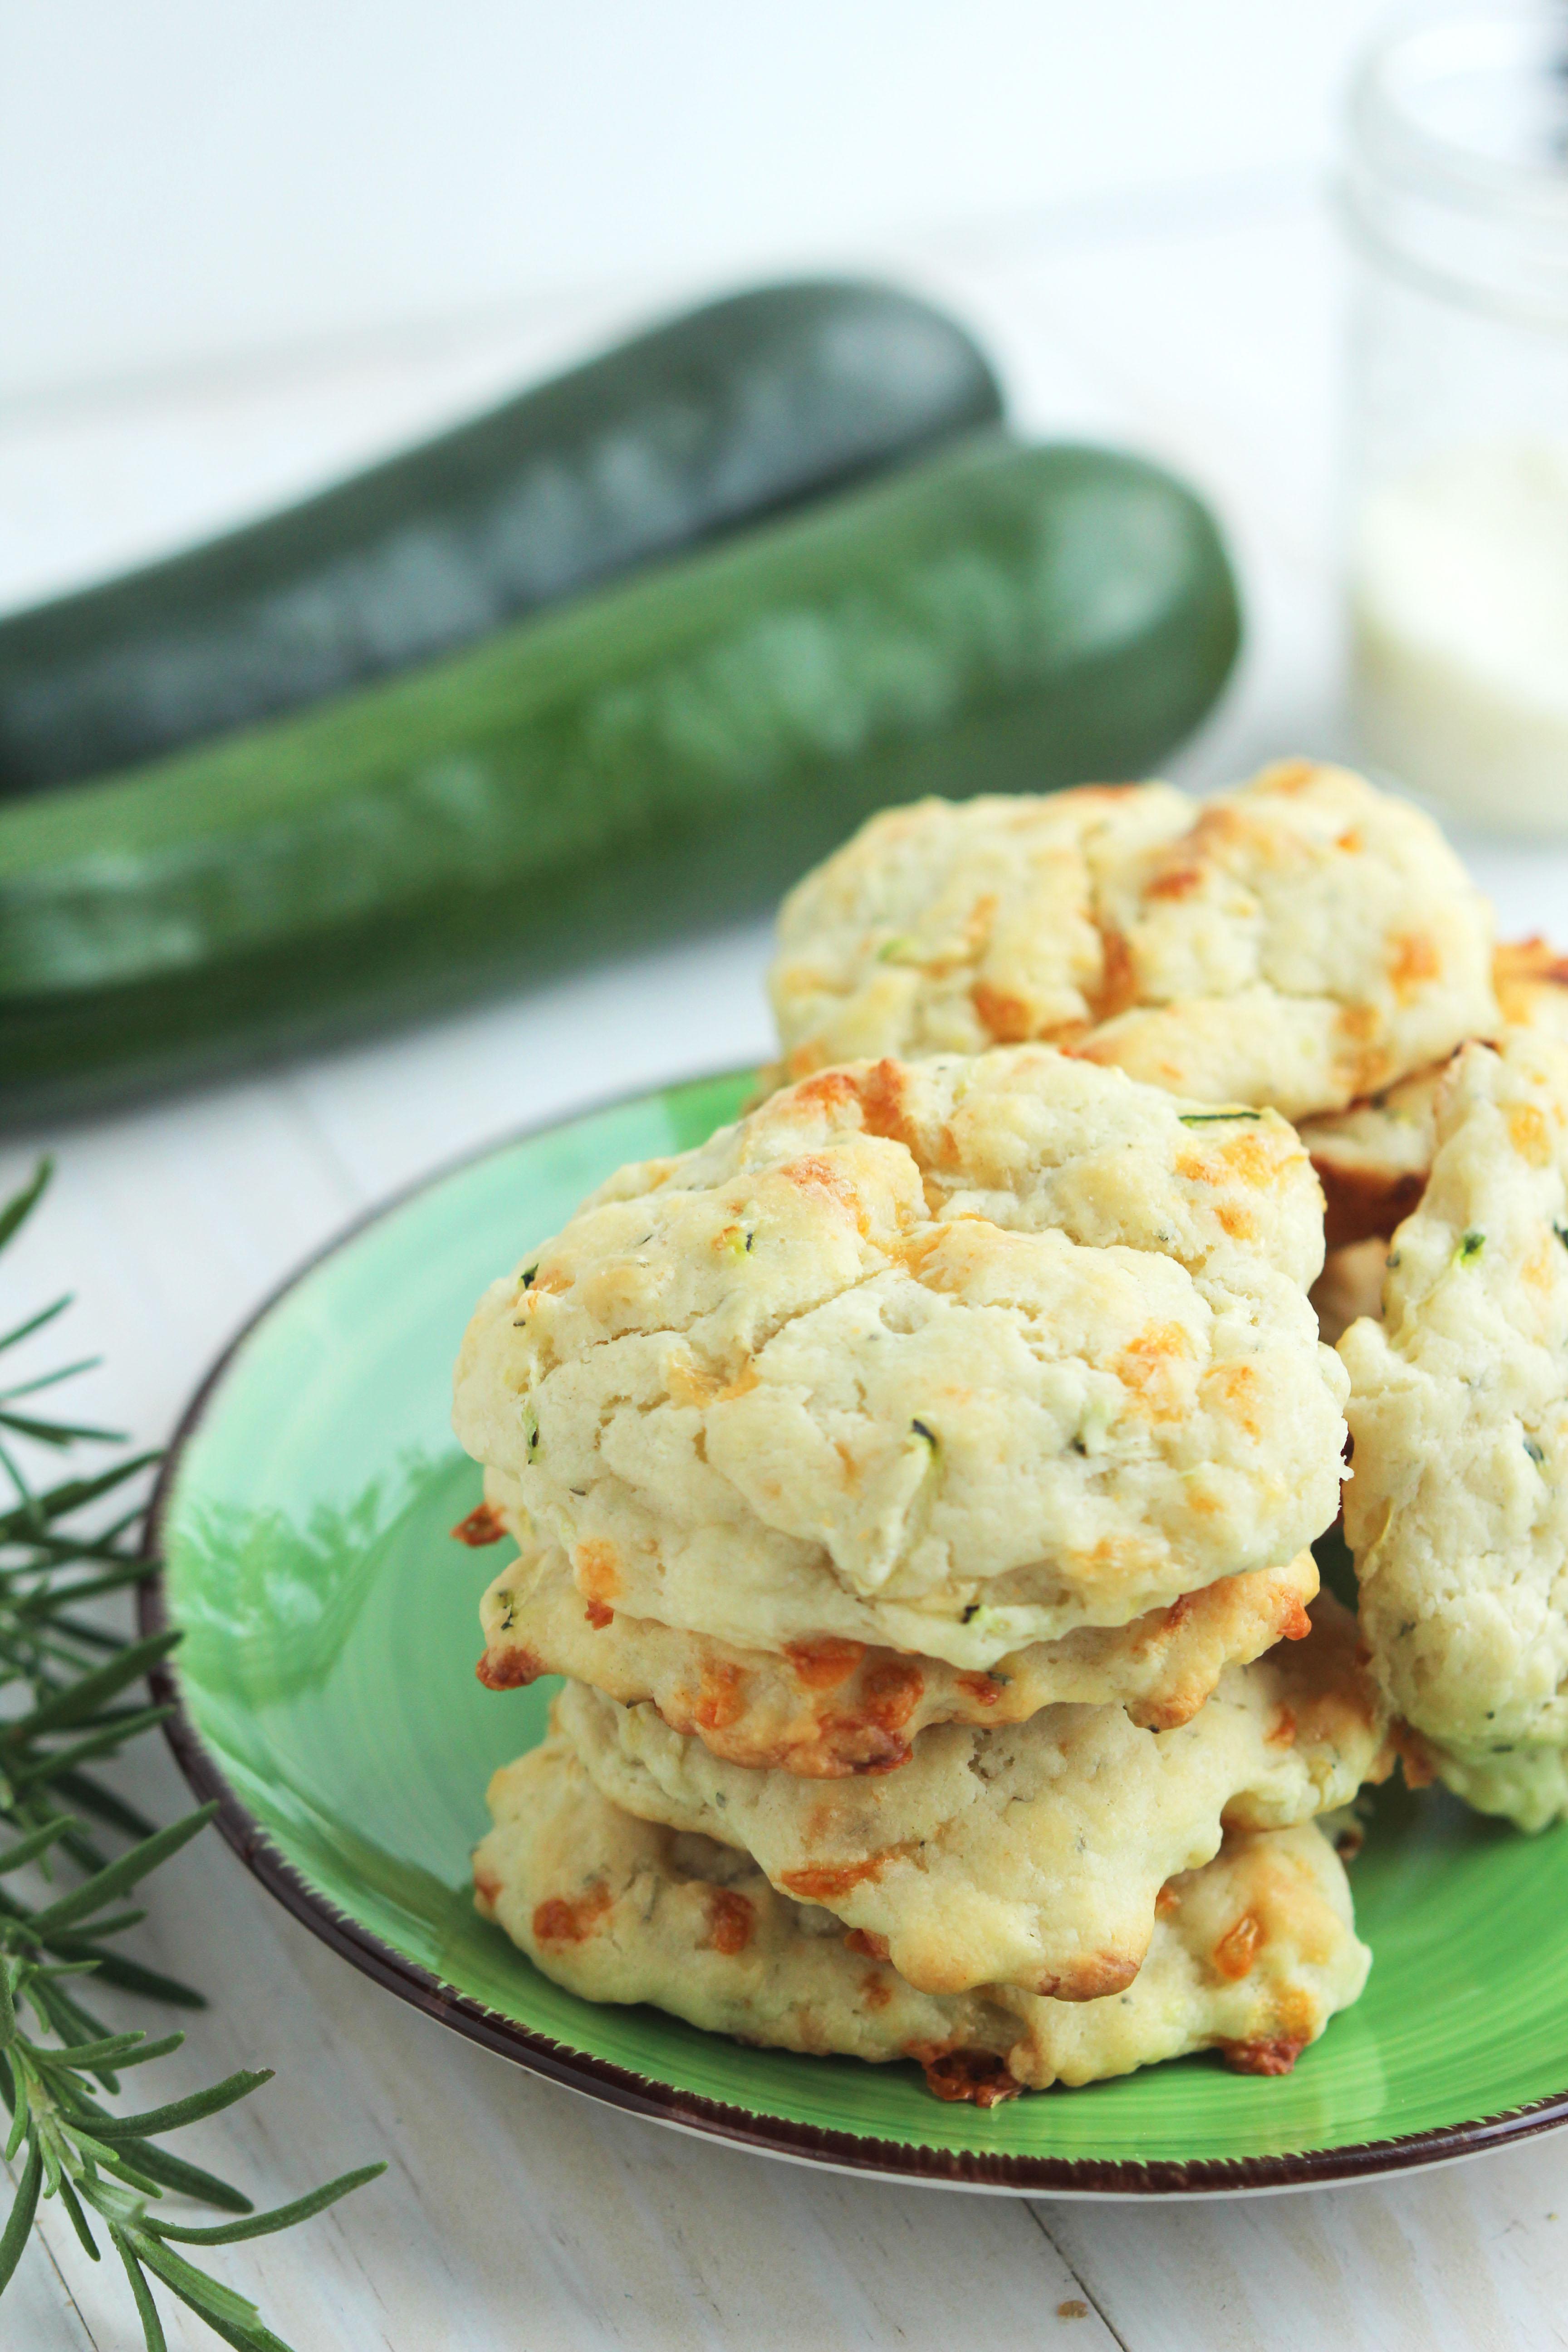 Zucchini Parmesan Buttermilk Biscuits